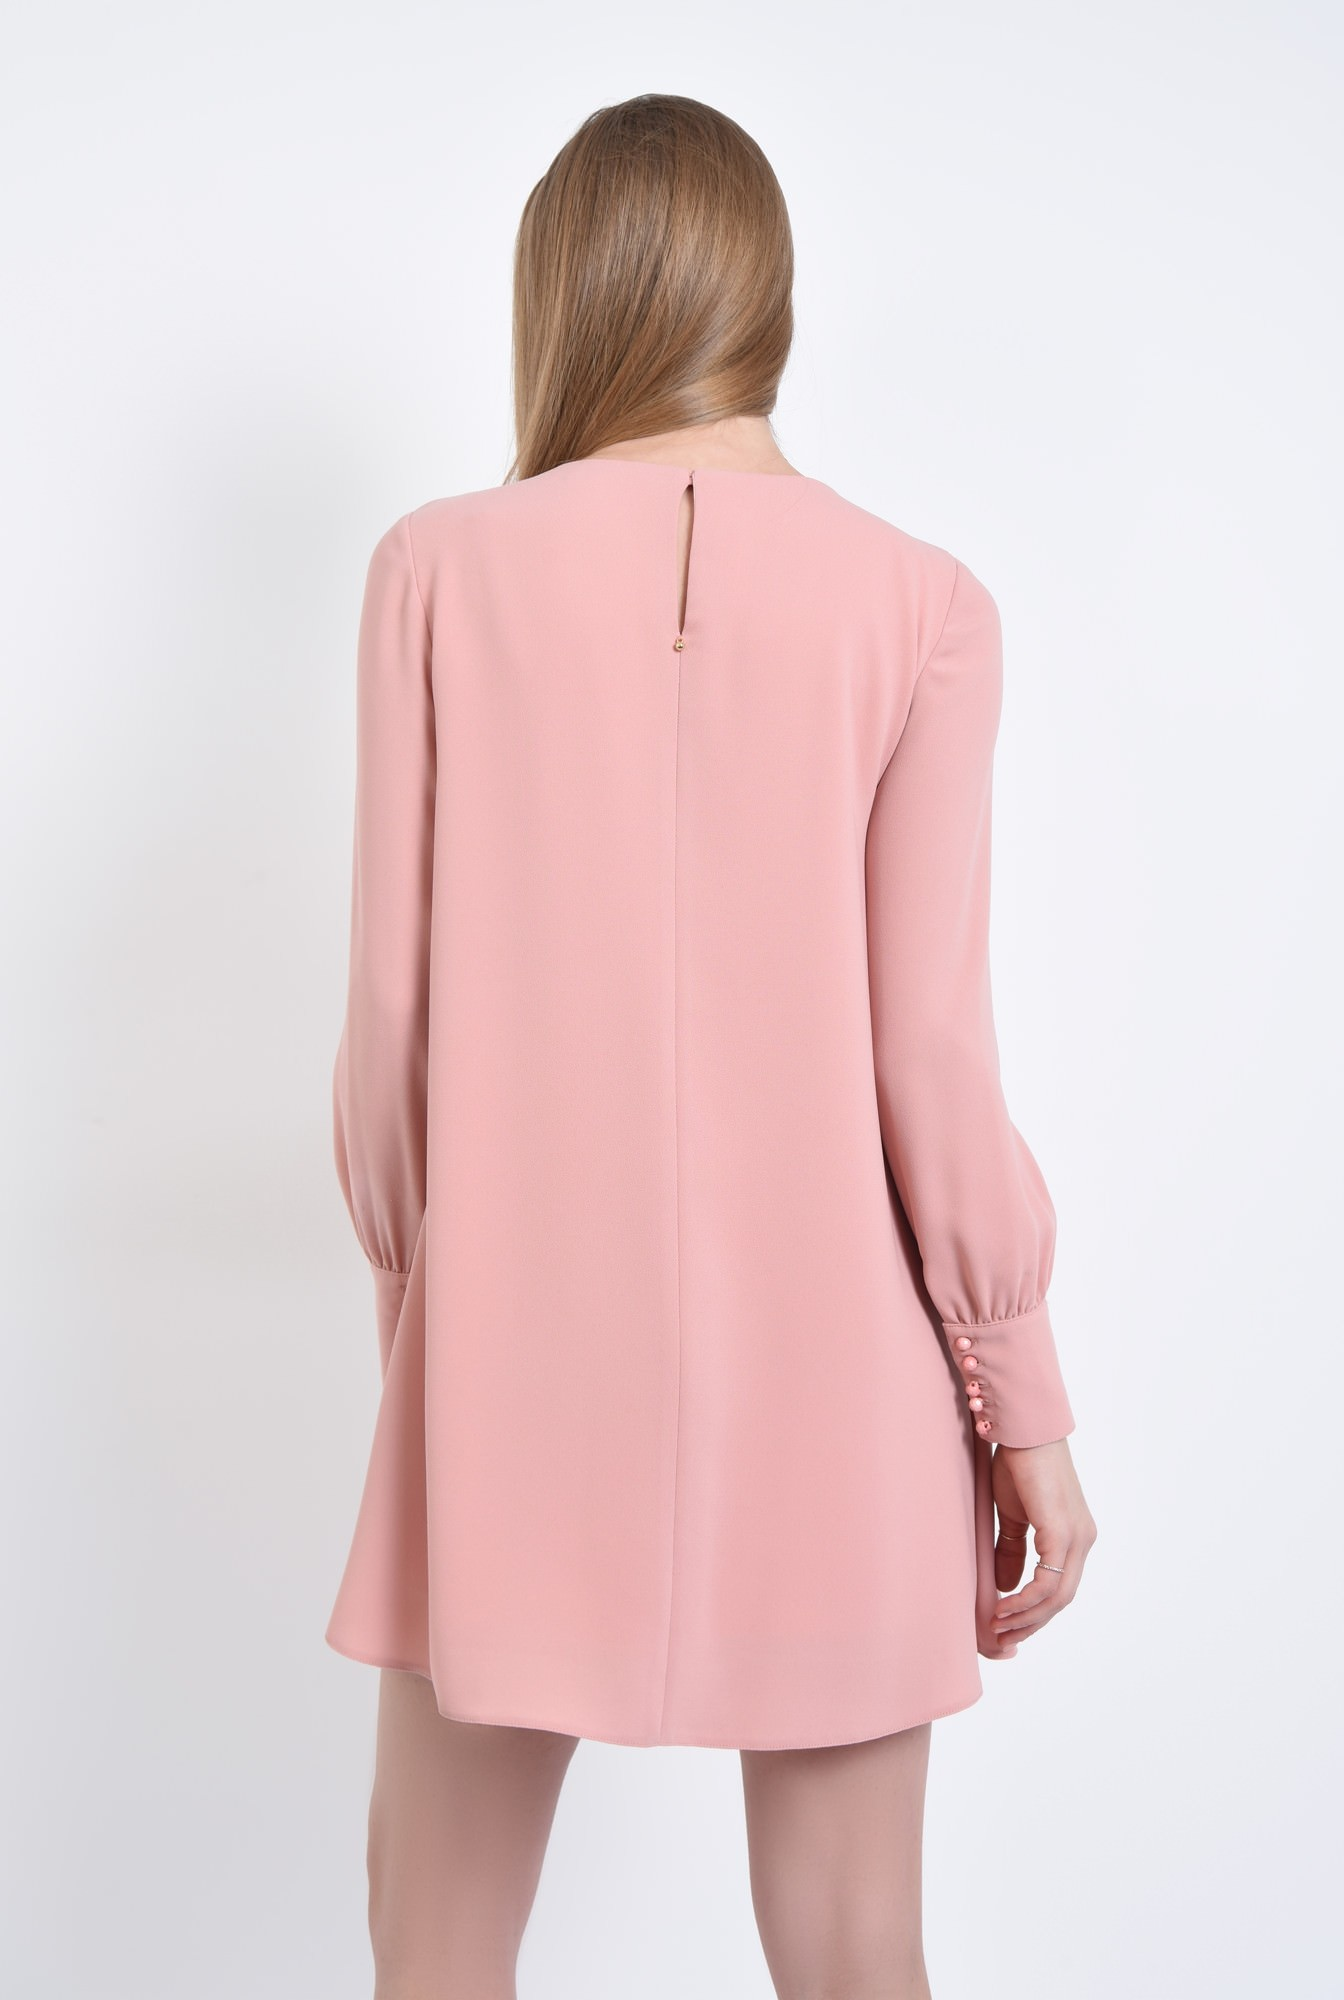 1 - Rochie de zi scurta, roz